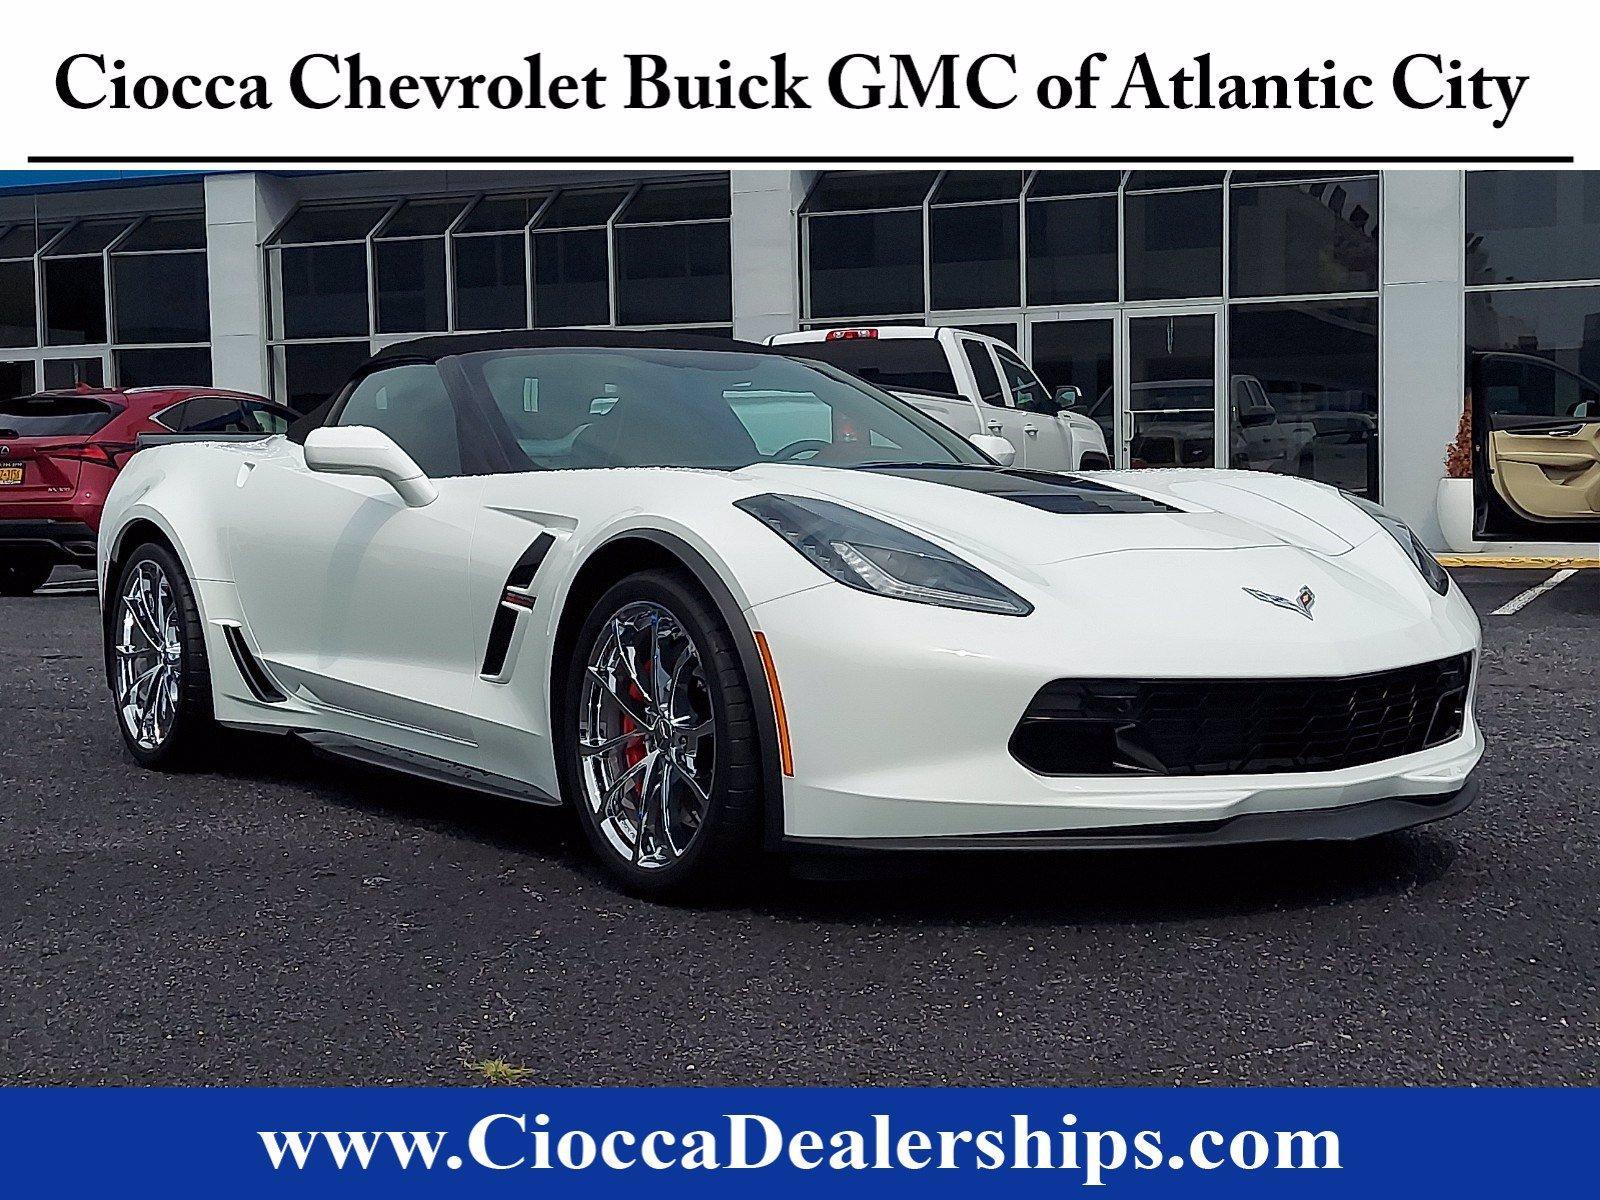 2019 Chevrolet Corvette Vehicle Photo in Atlantic City, NJ 08401